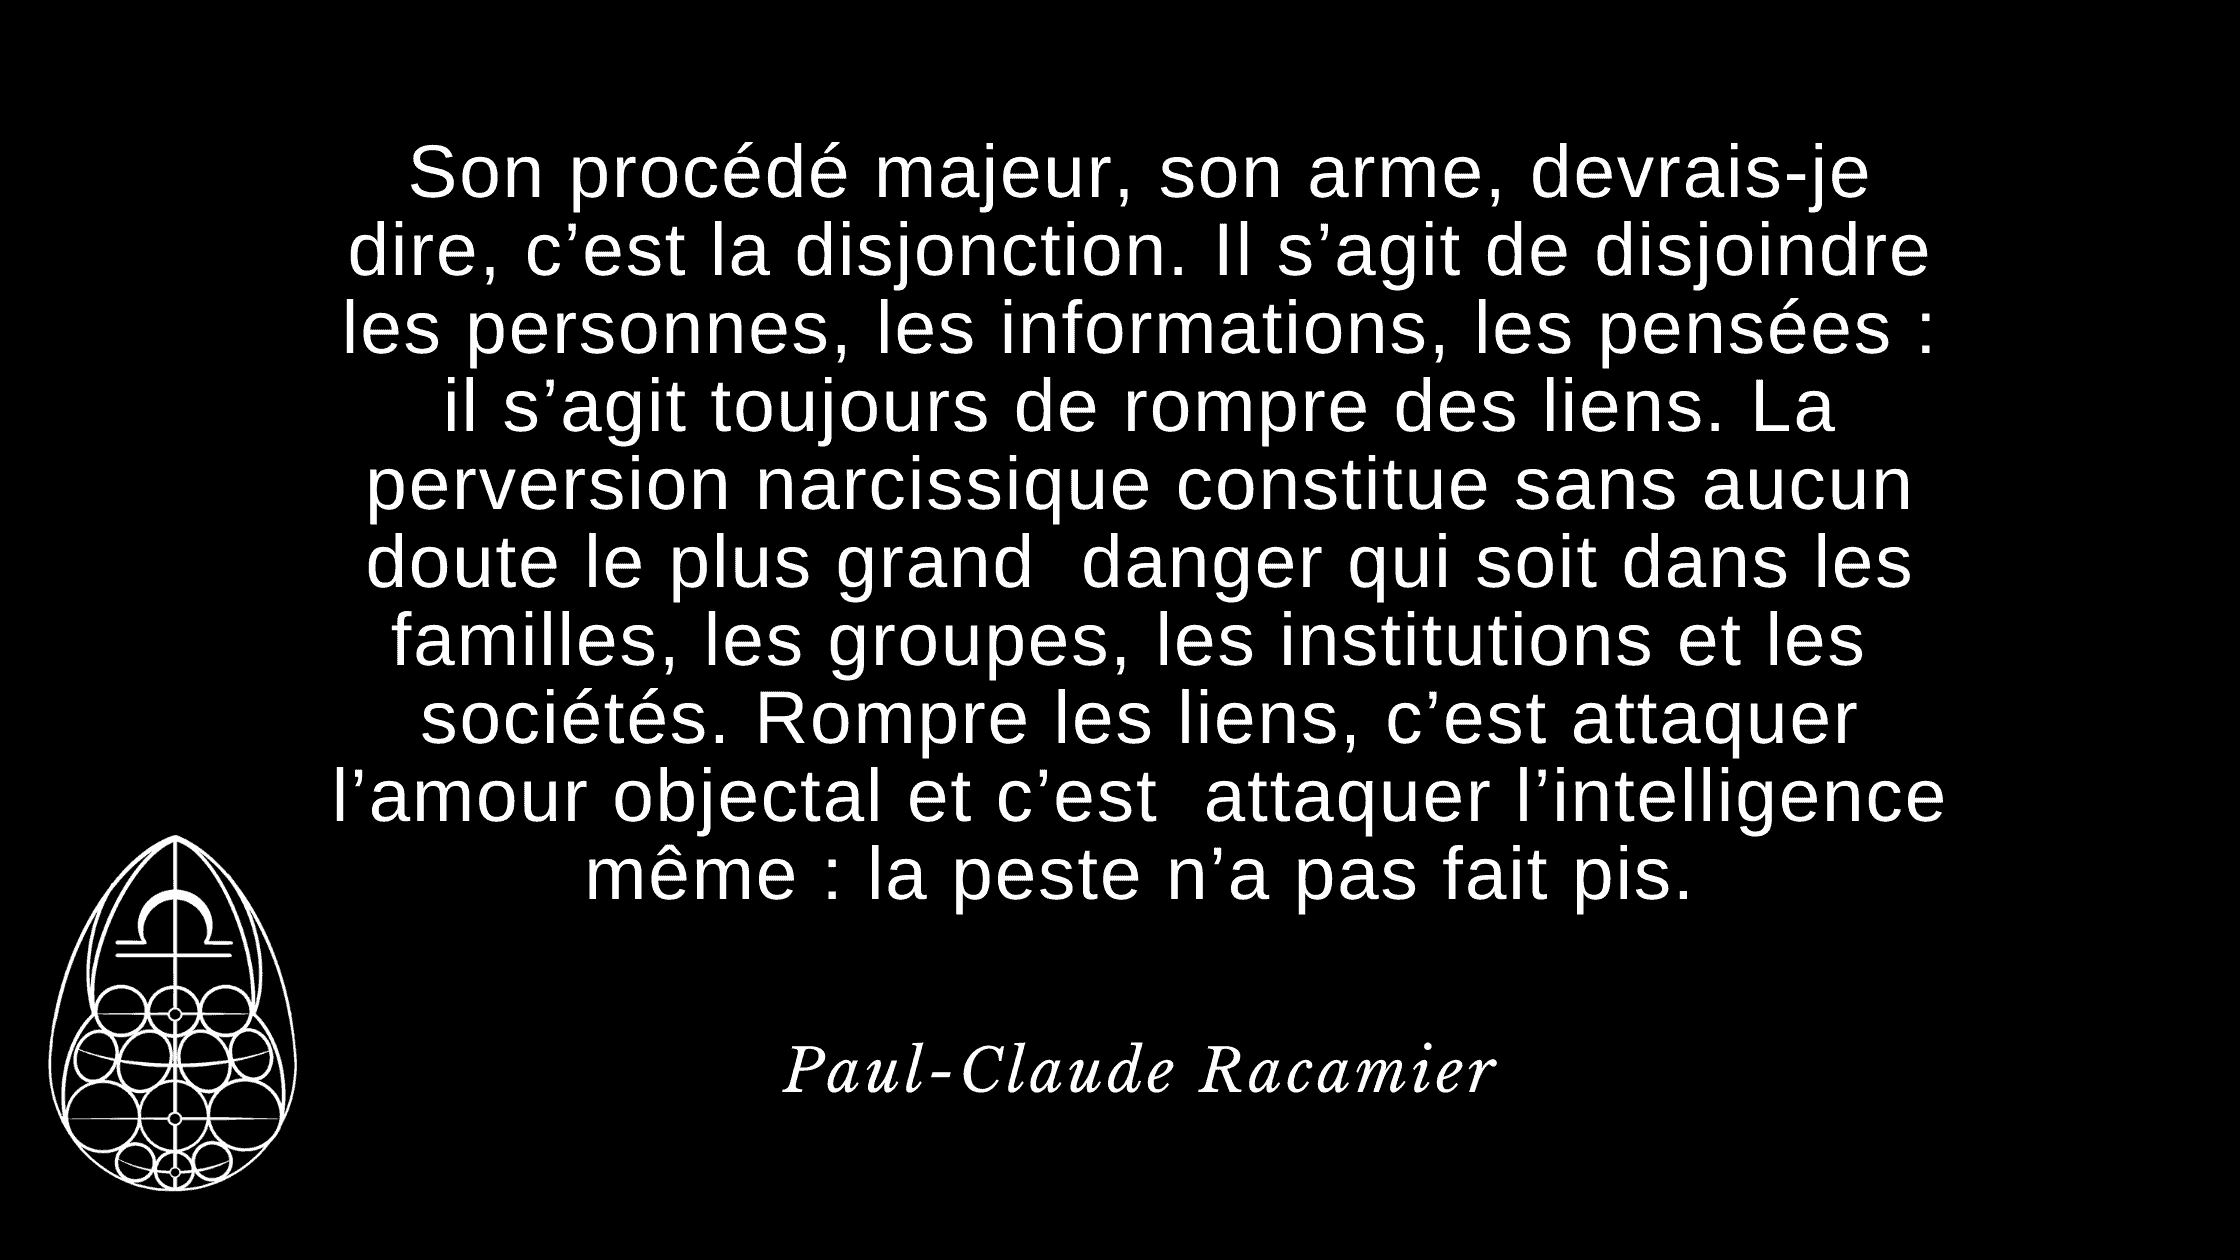 Paul-Claude Racamier